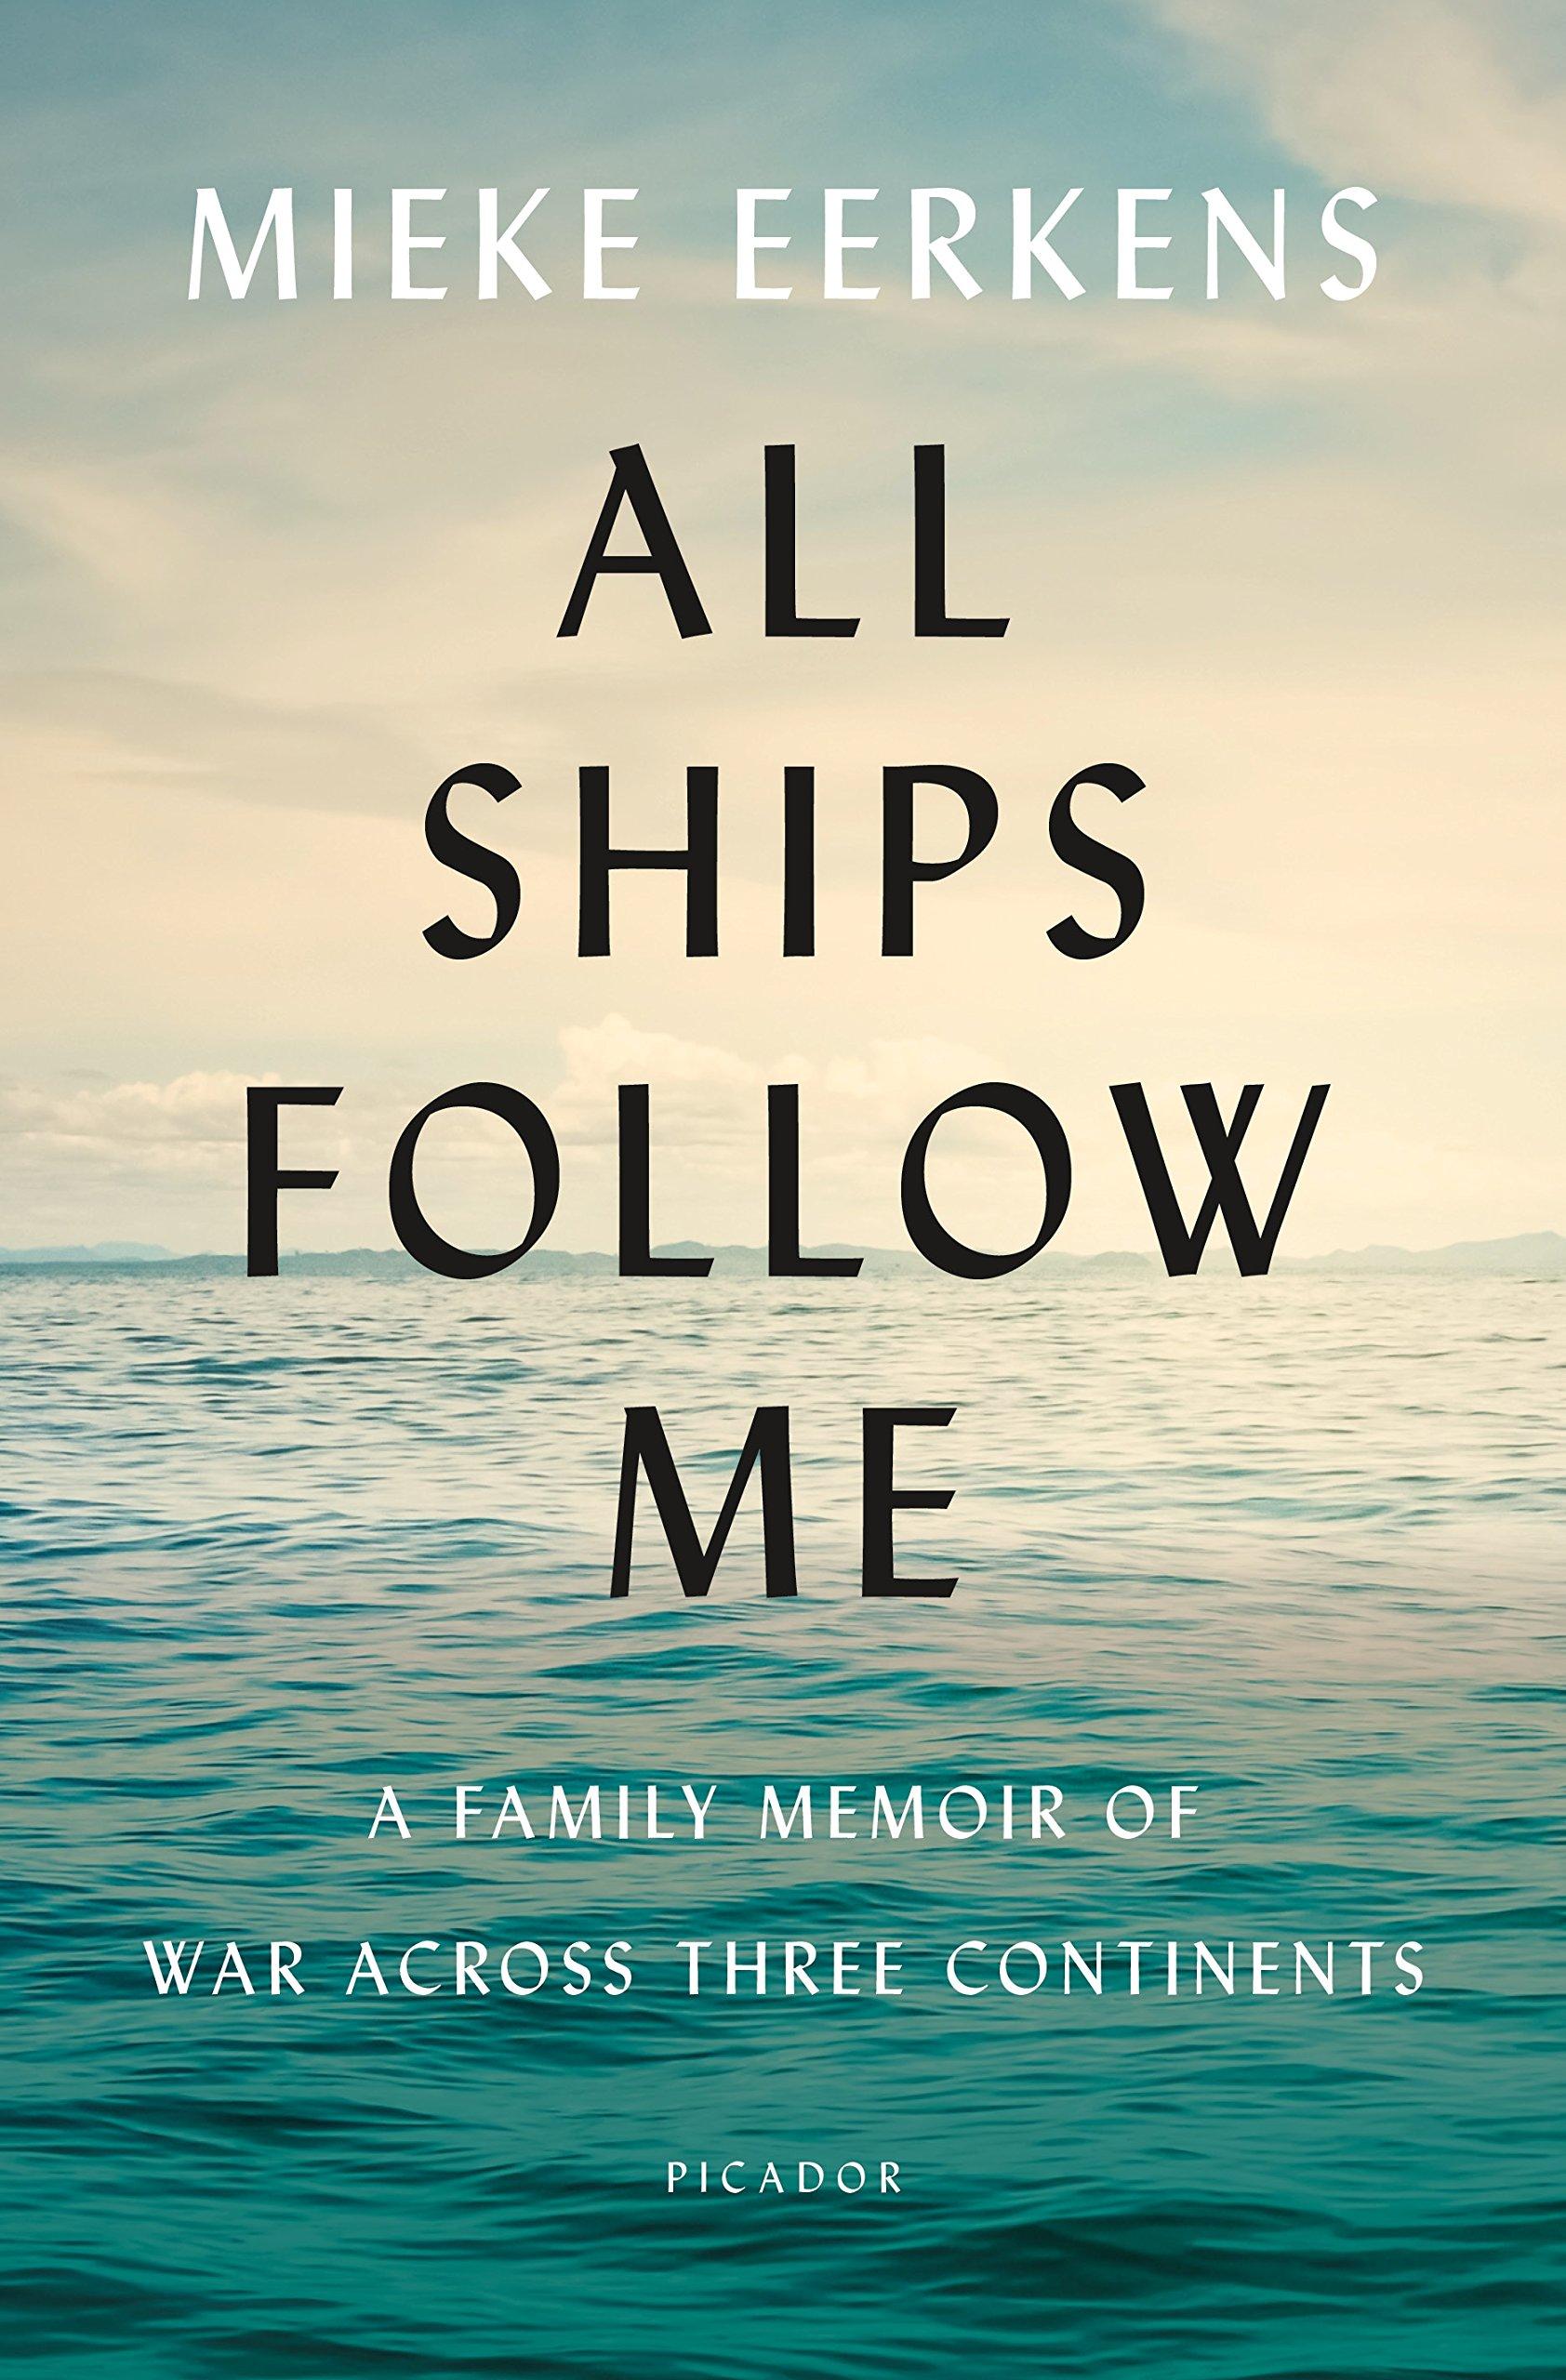 All Ships Follow Me.jpg